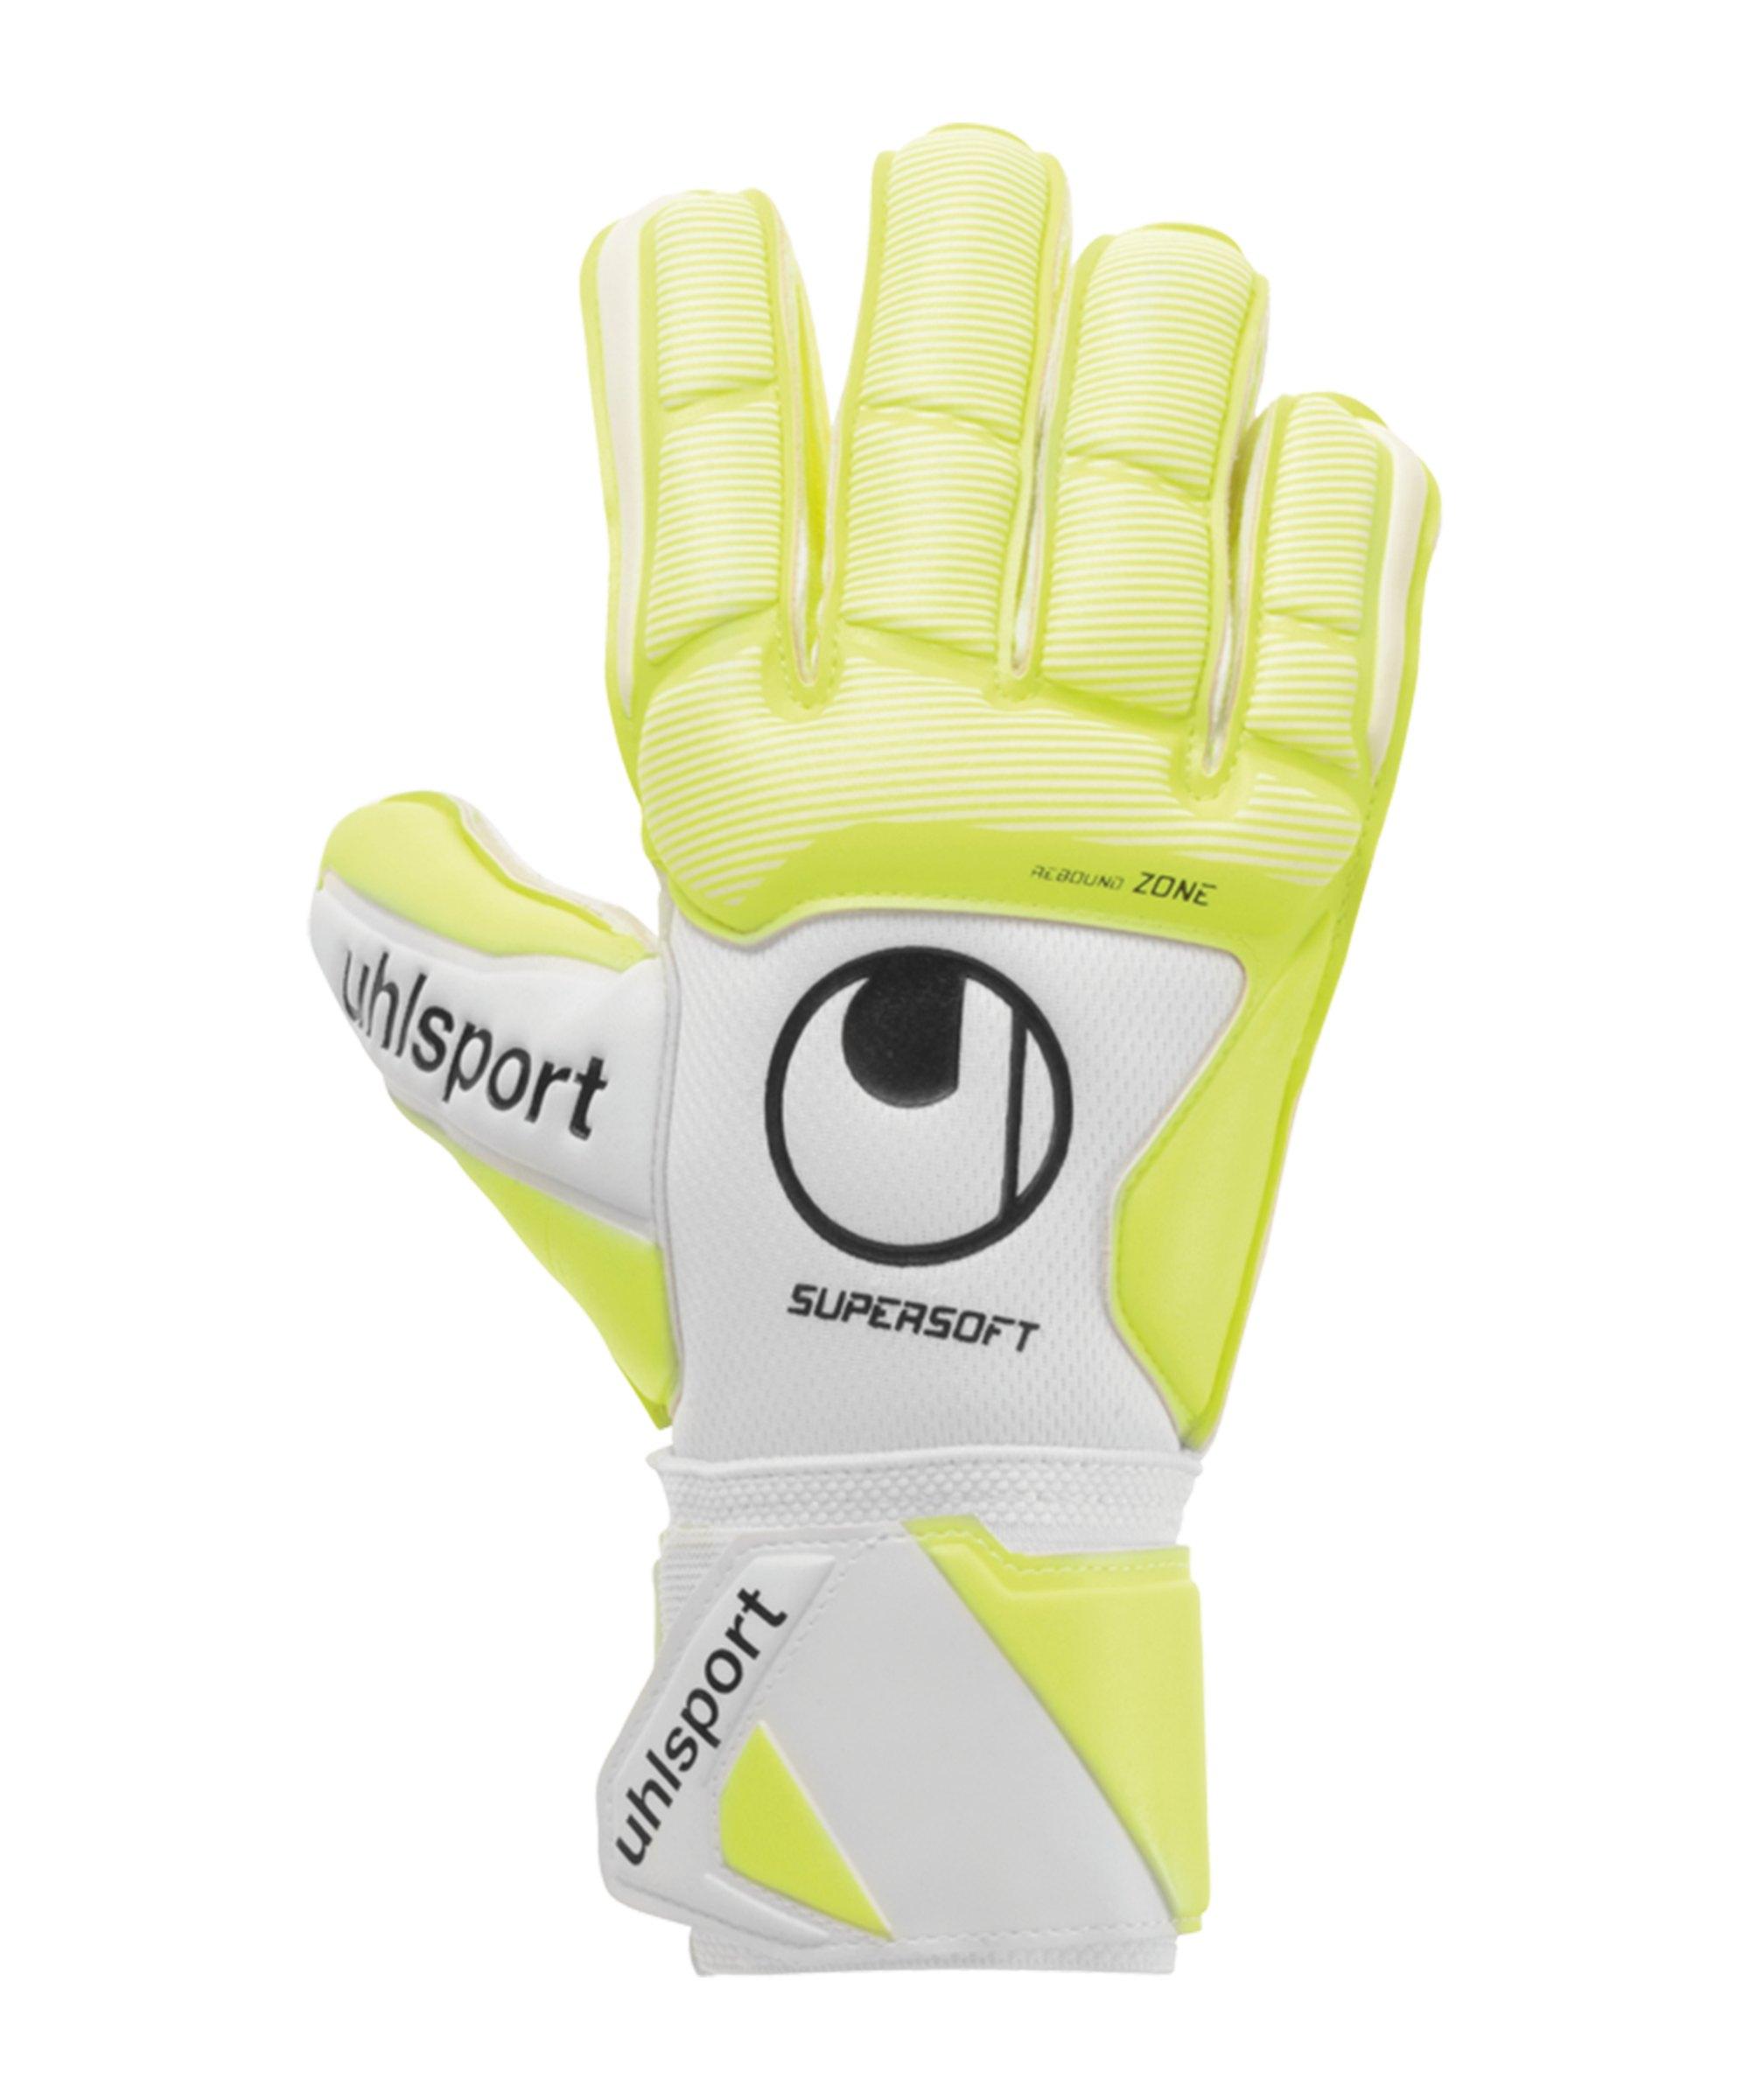 Uhlsport Pure Alliance Supersoft Handschuh F01 - weiss